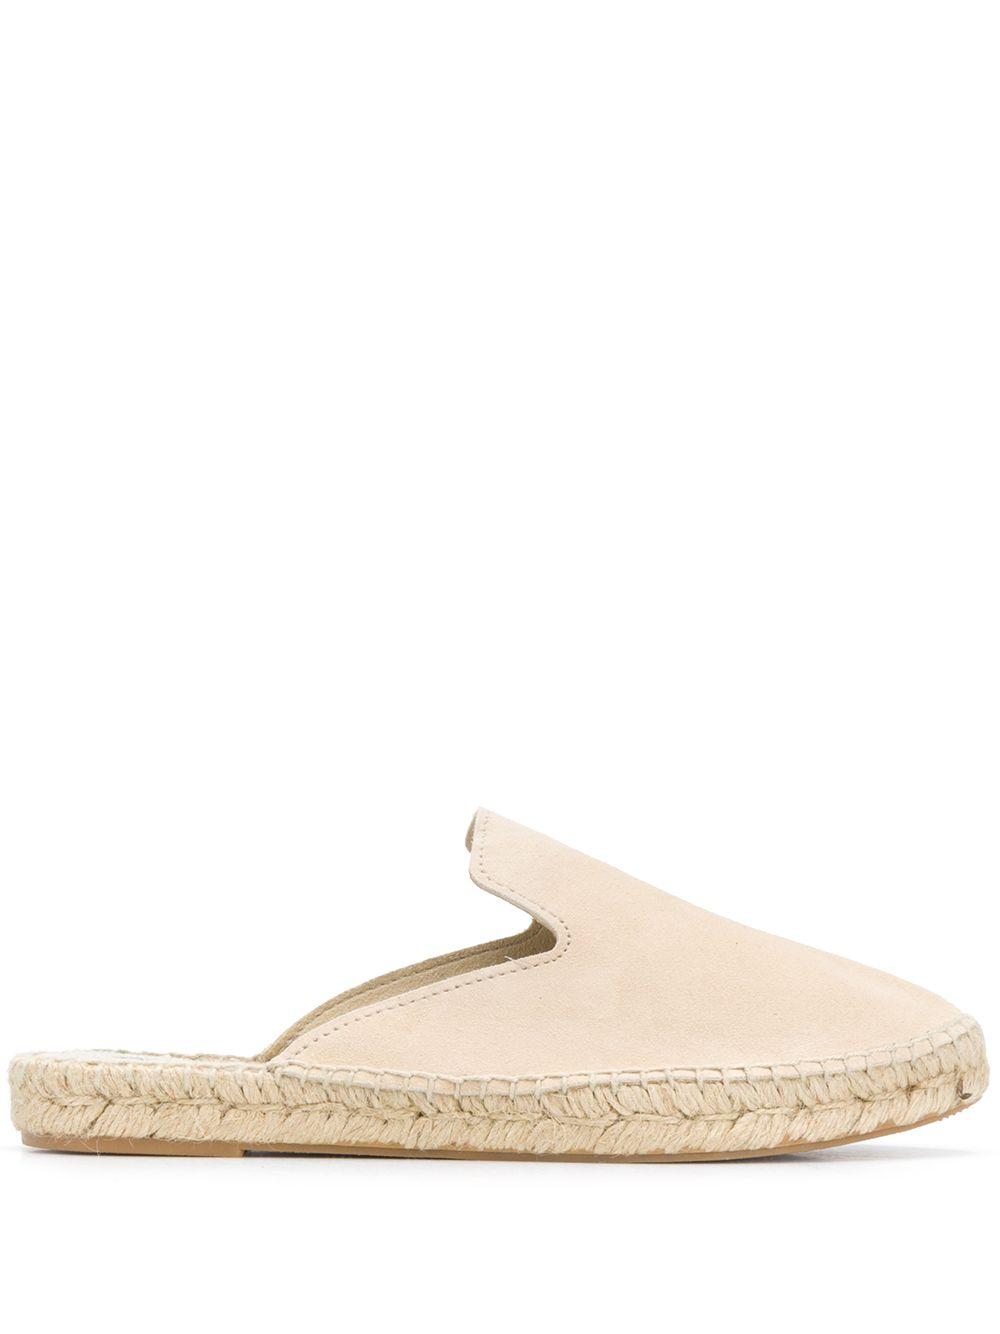 Hamptons Slippers